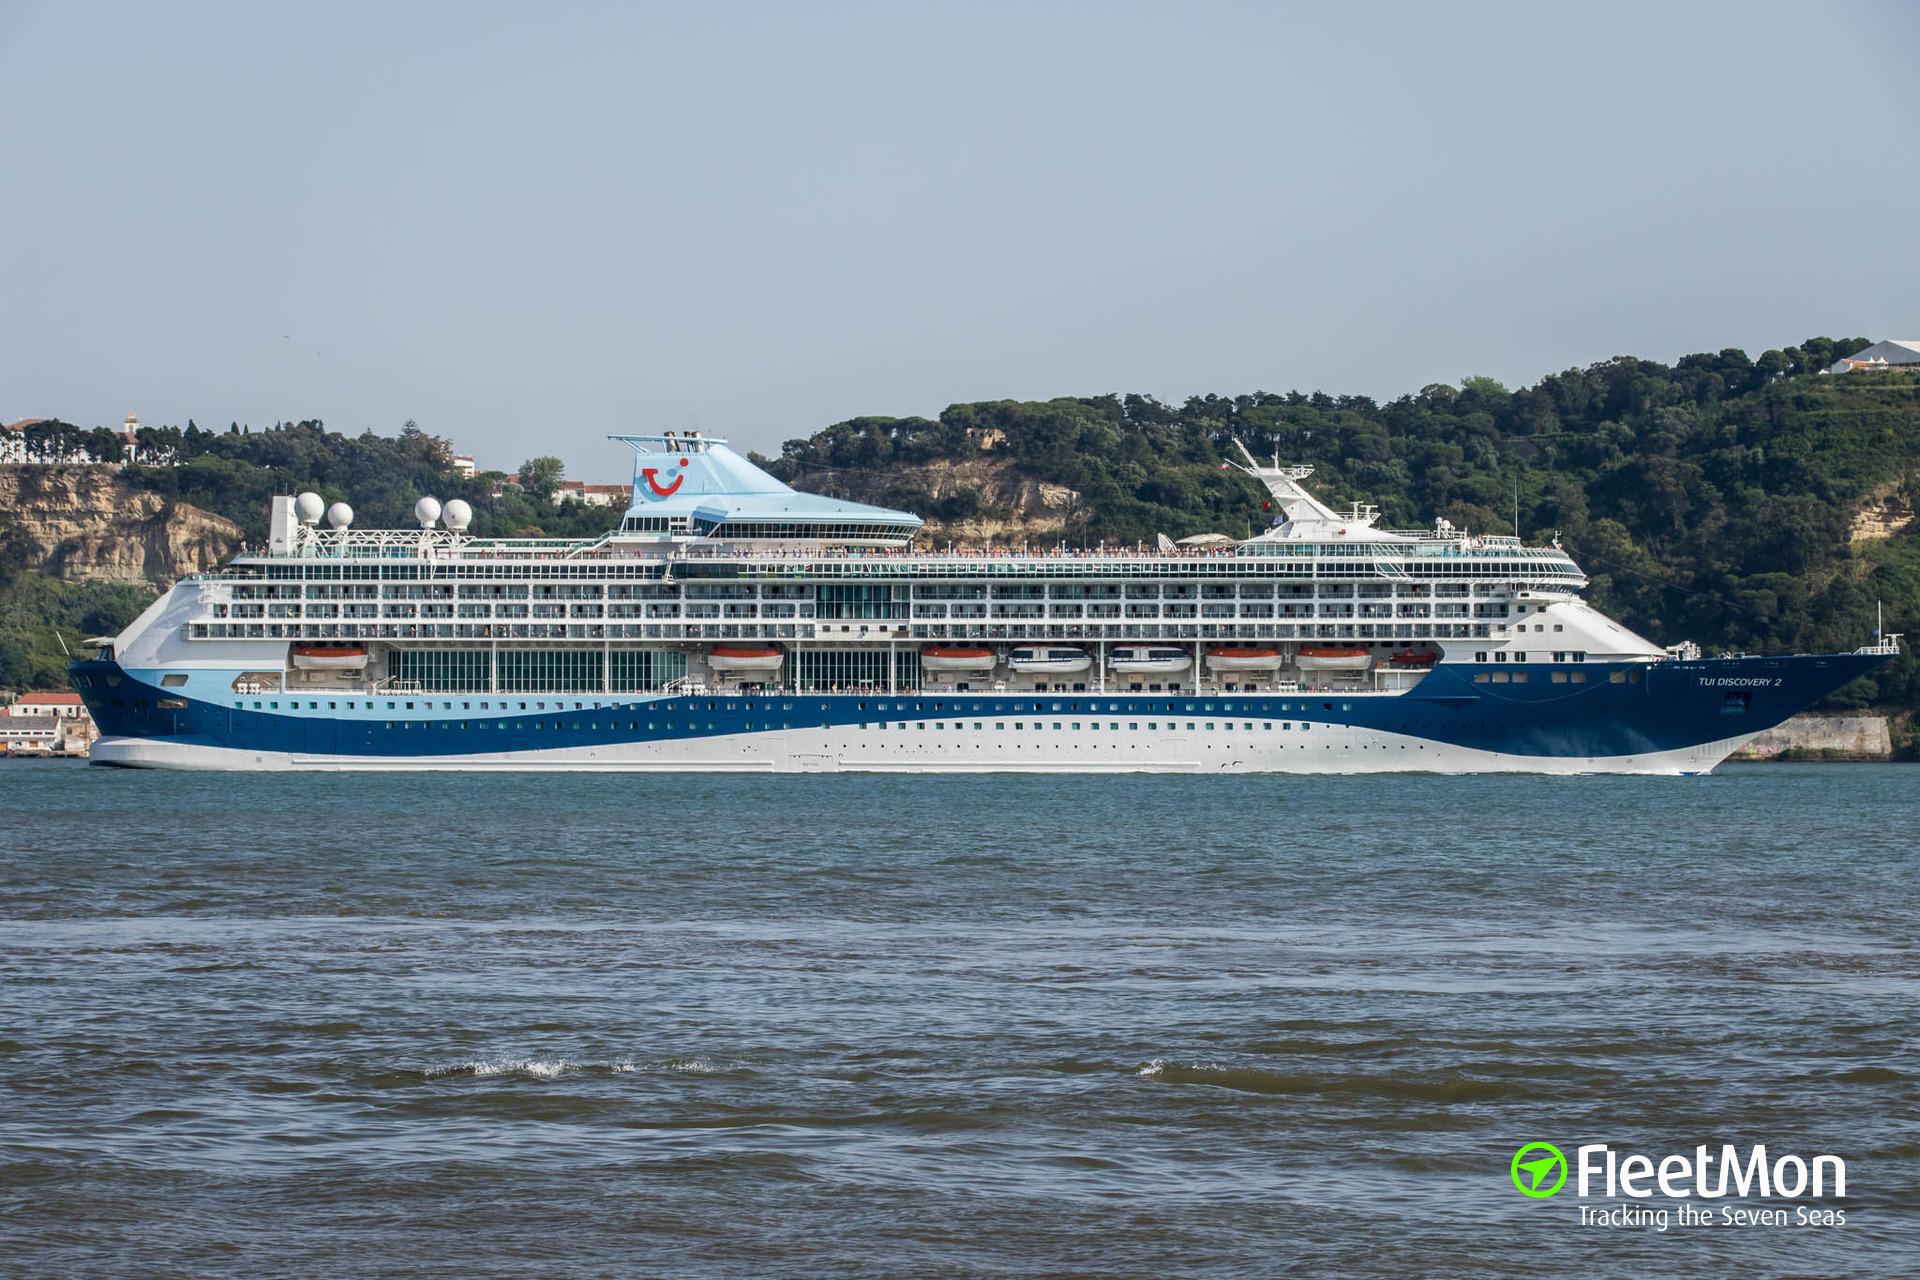   Cruise ship MARELLA DISCOVERY 2 disabled in Venice historic center